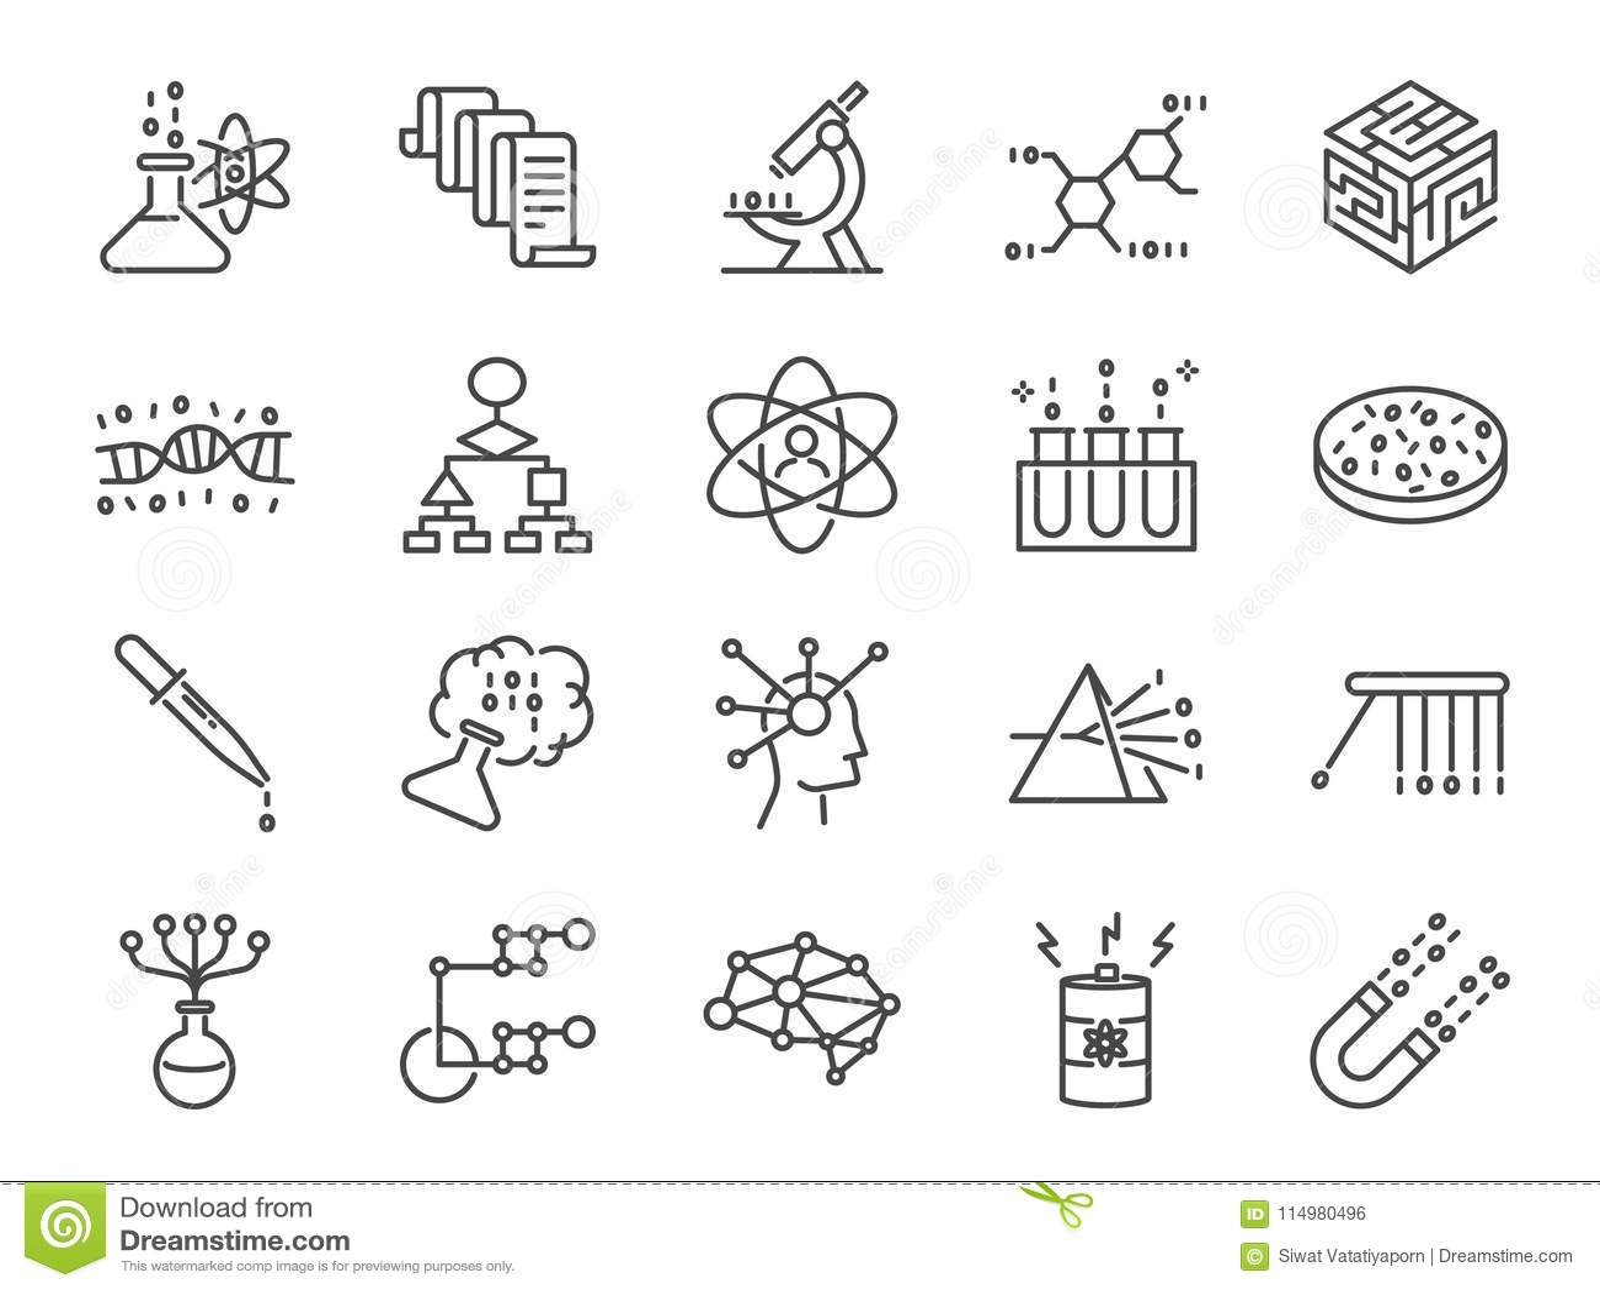 Procedure Cartoons Illustrations Amp Vector Stock Images